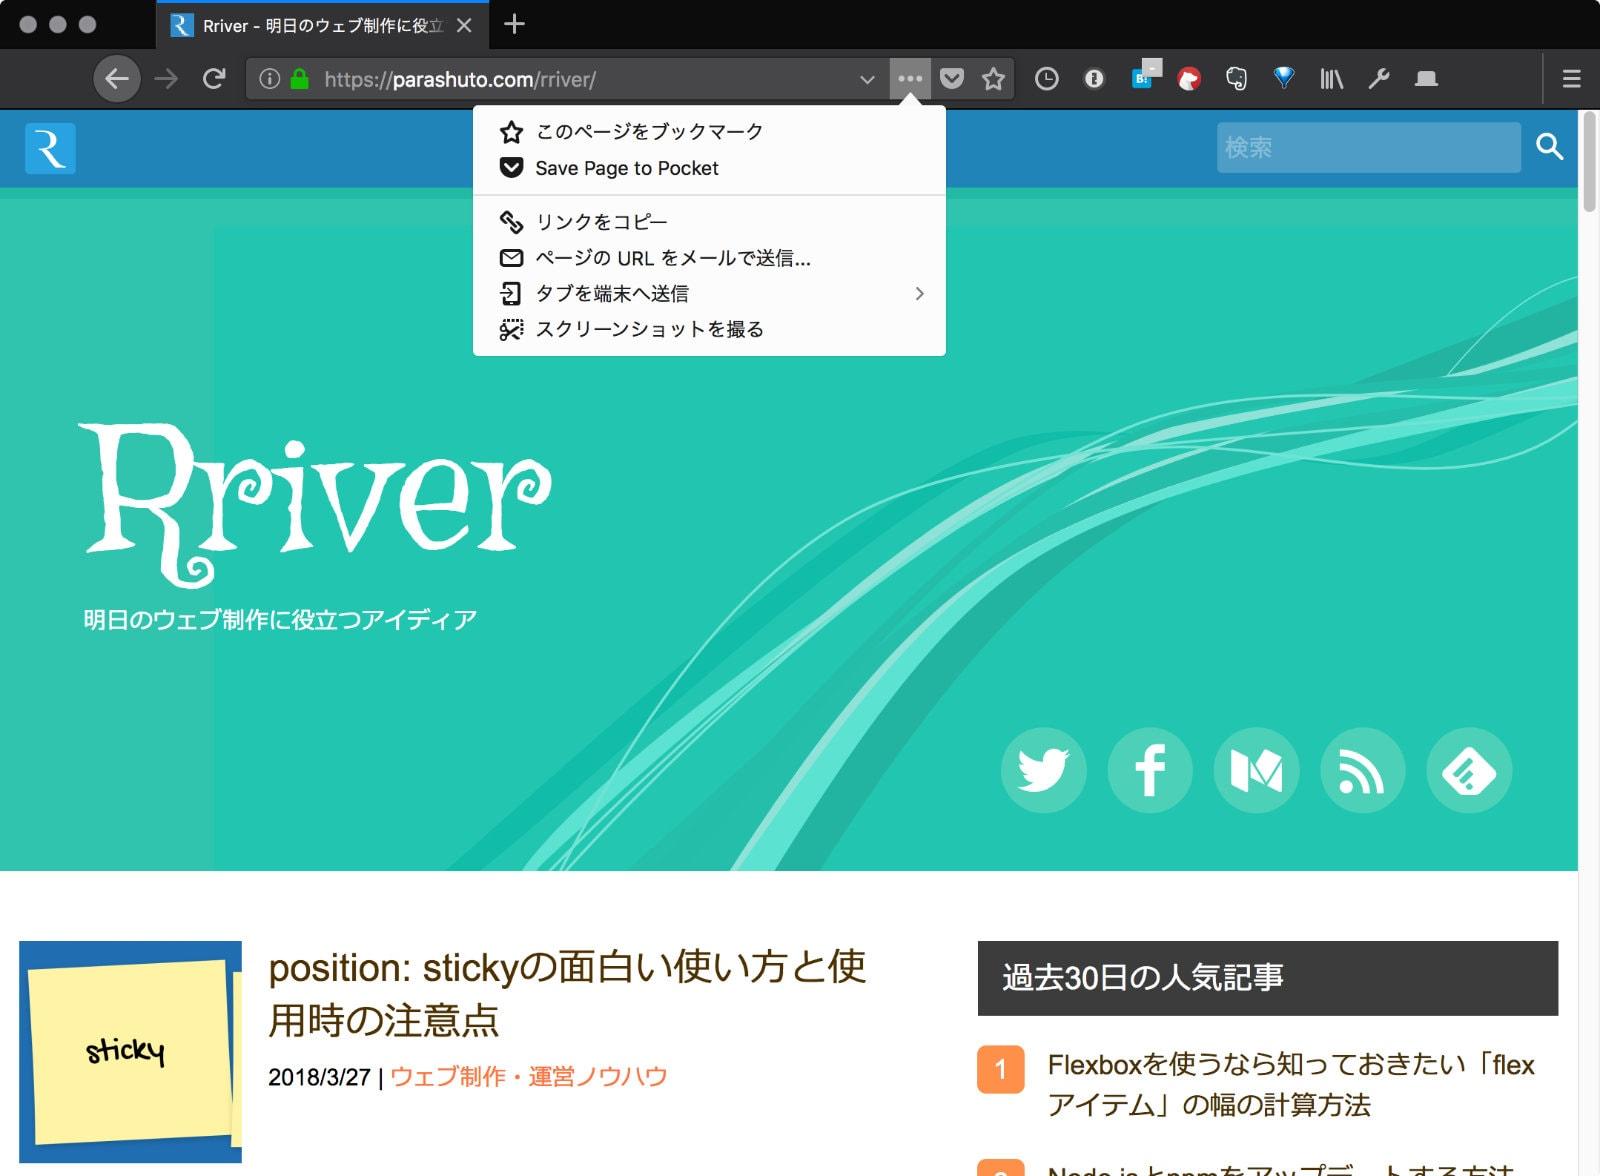 FirefoxのアドレスバーにあるFirefox Screenshotsを開くためのメニュー